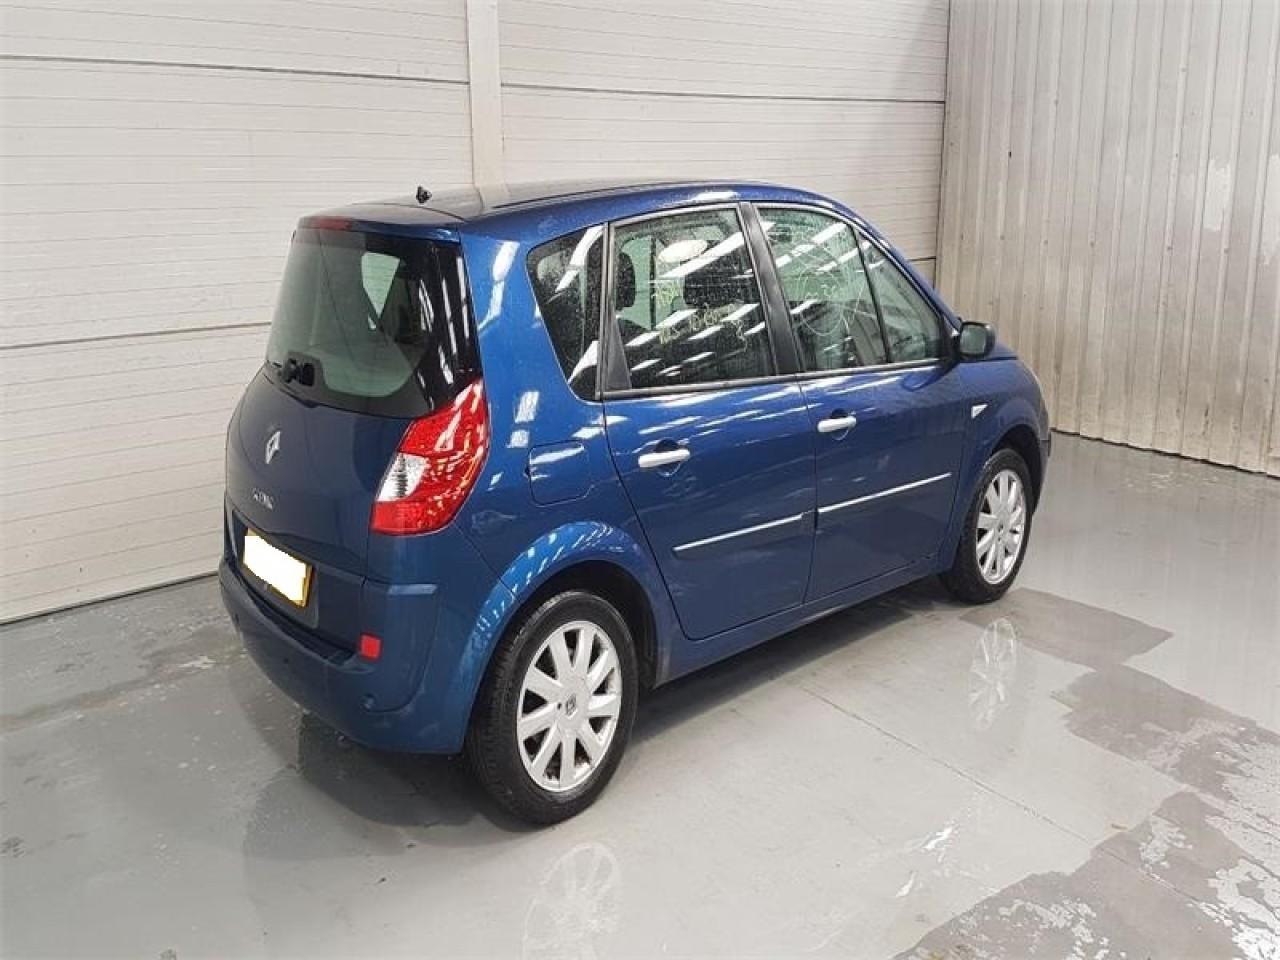 Clapeta acceleratie Renault Scenic 2009 Hatchback 1.6 i